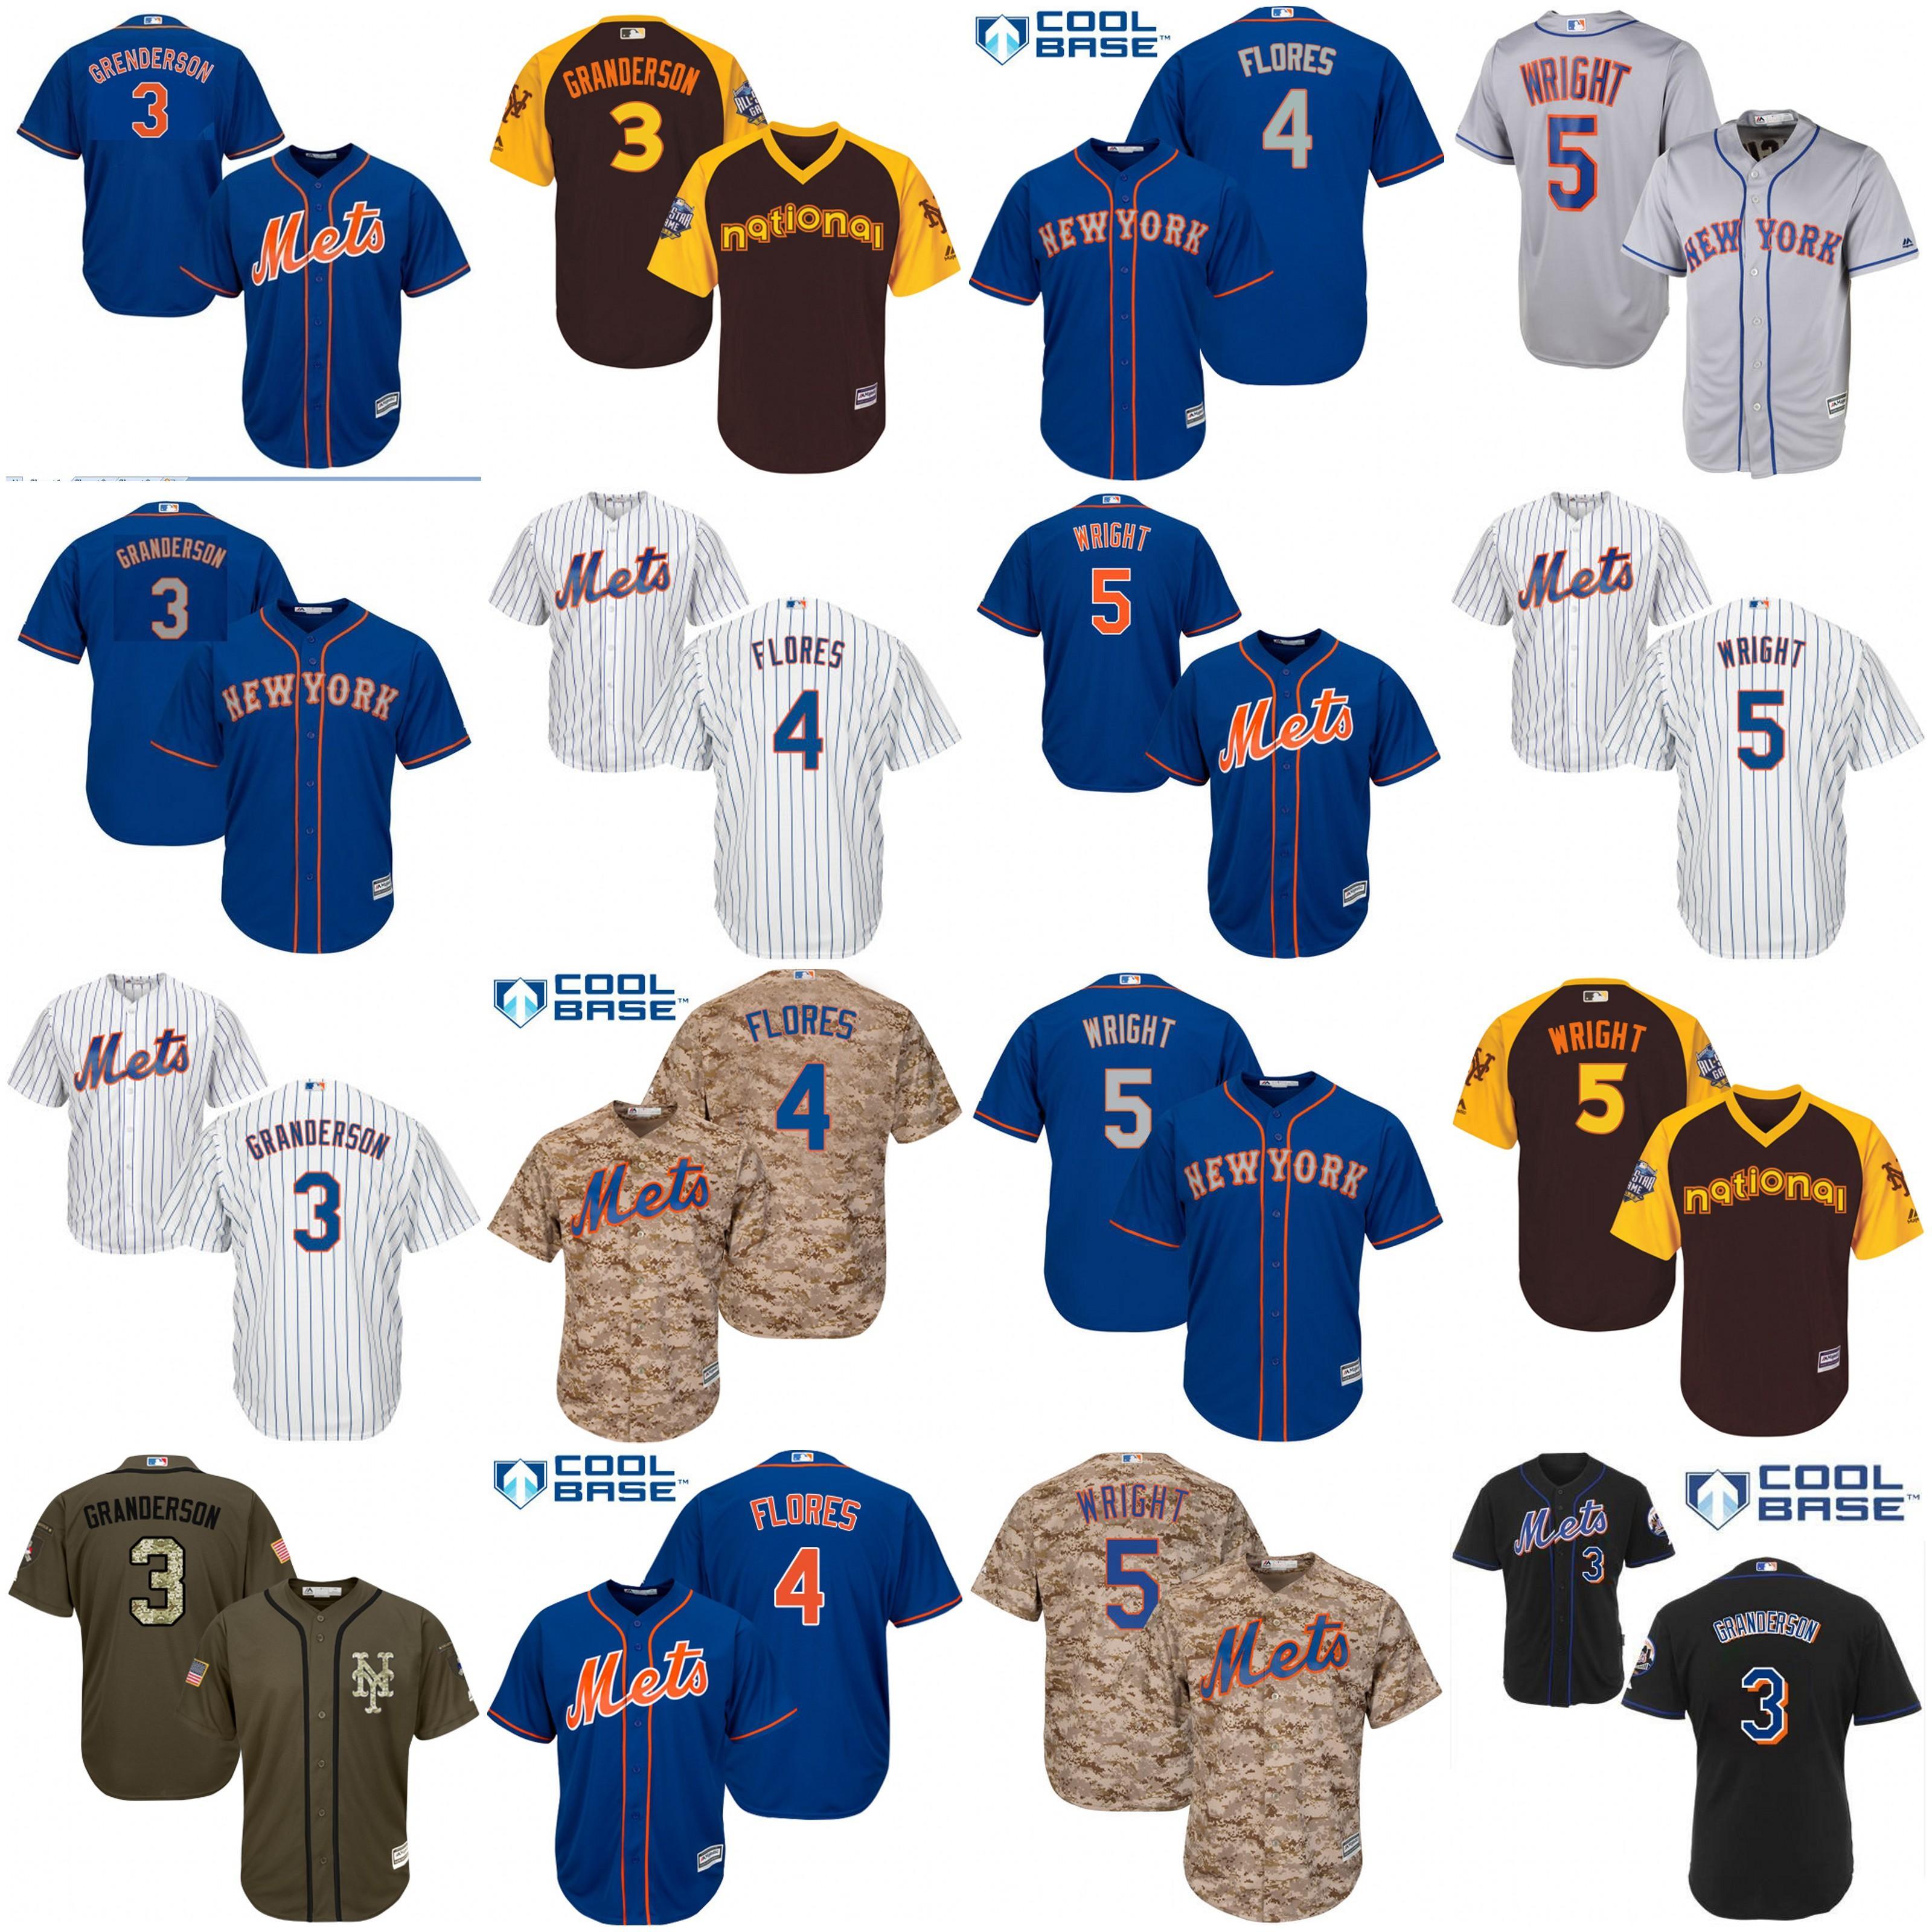 quality design efba6 84f33 new york mets 5 david wright los blue jersey